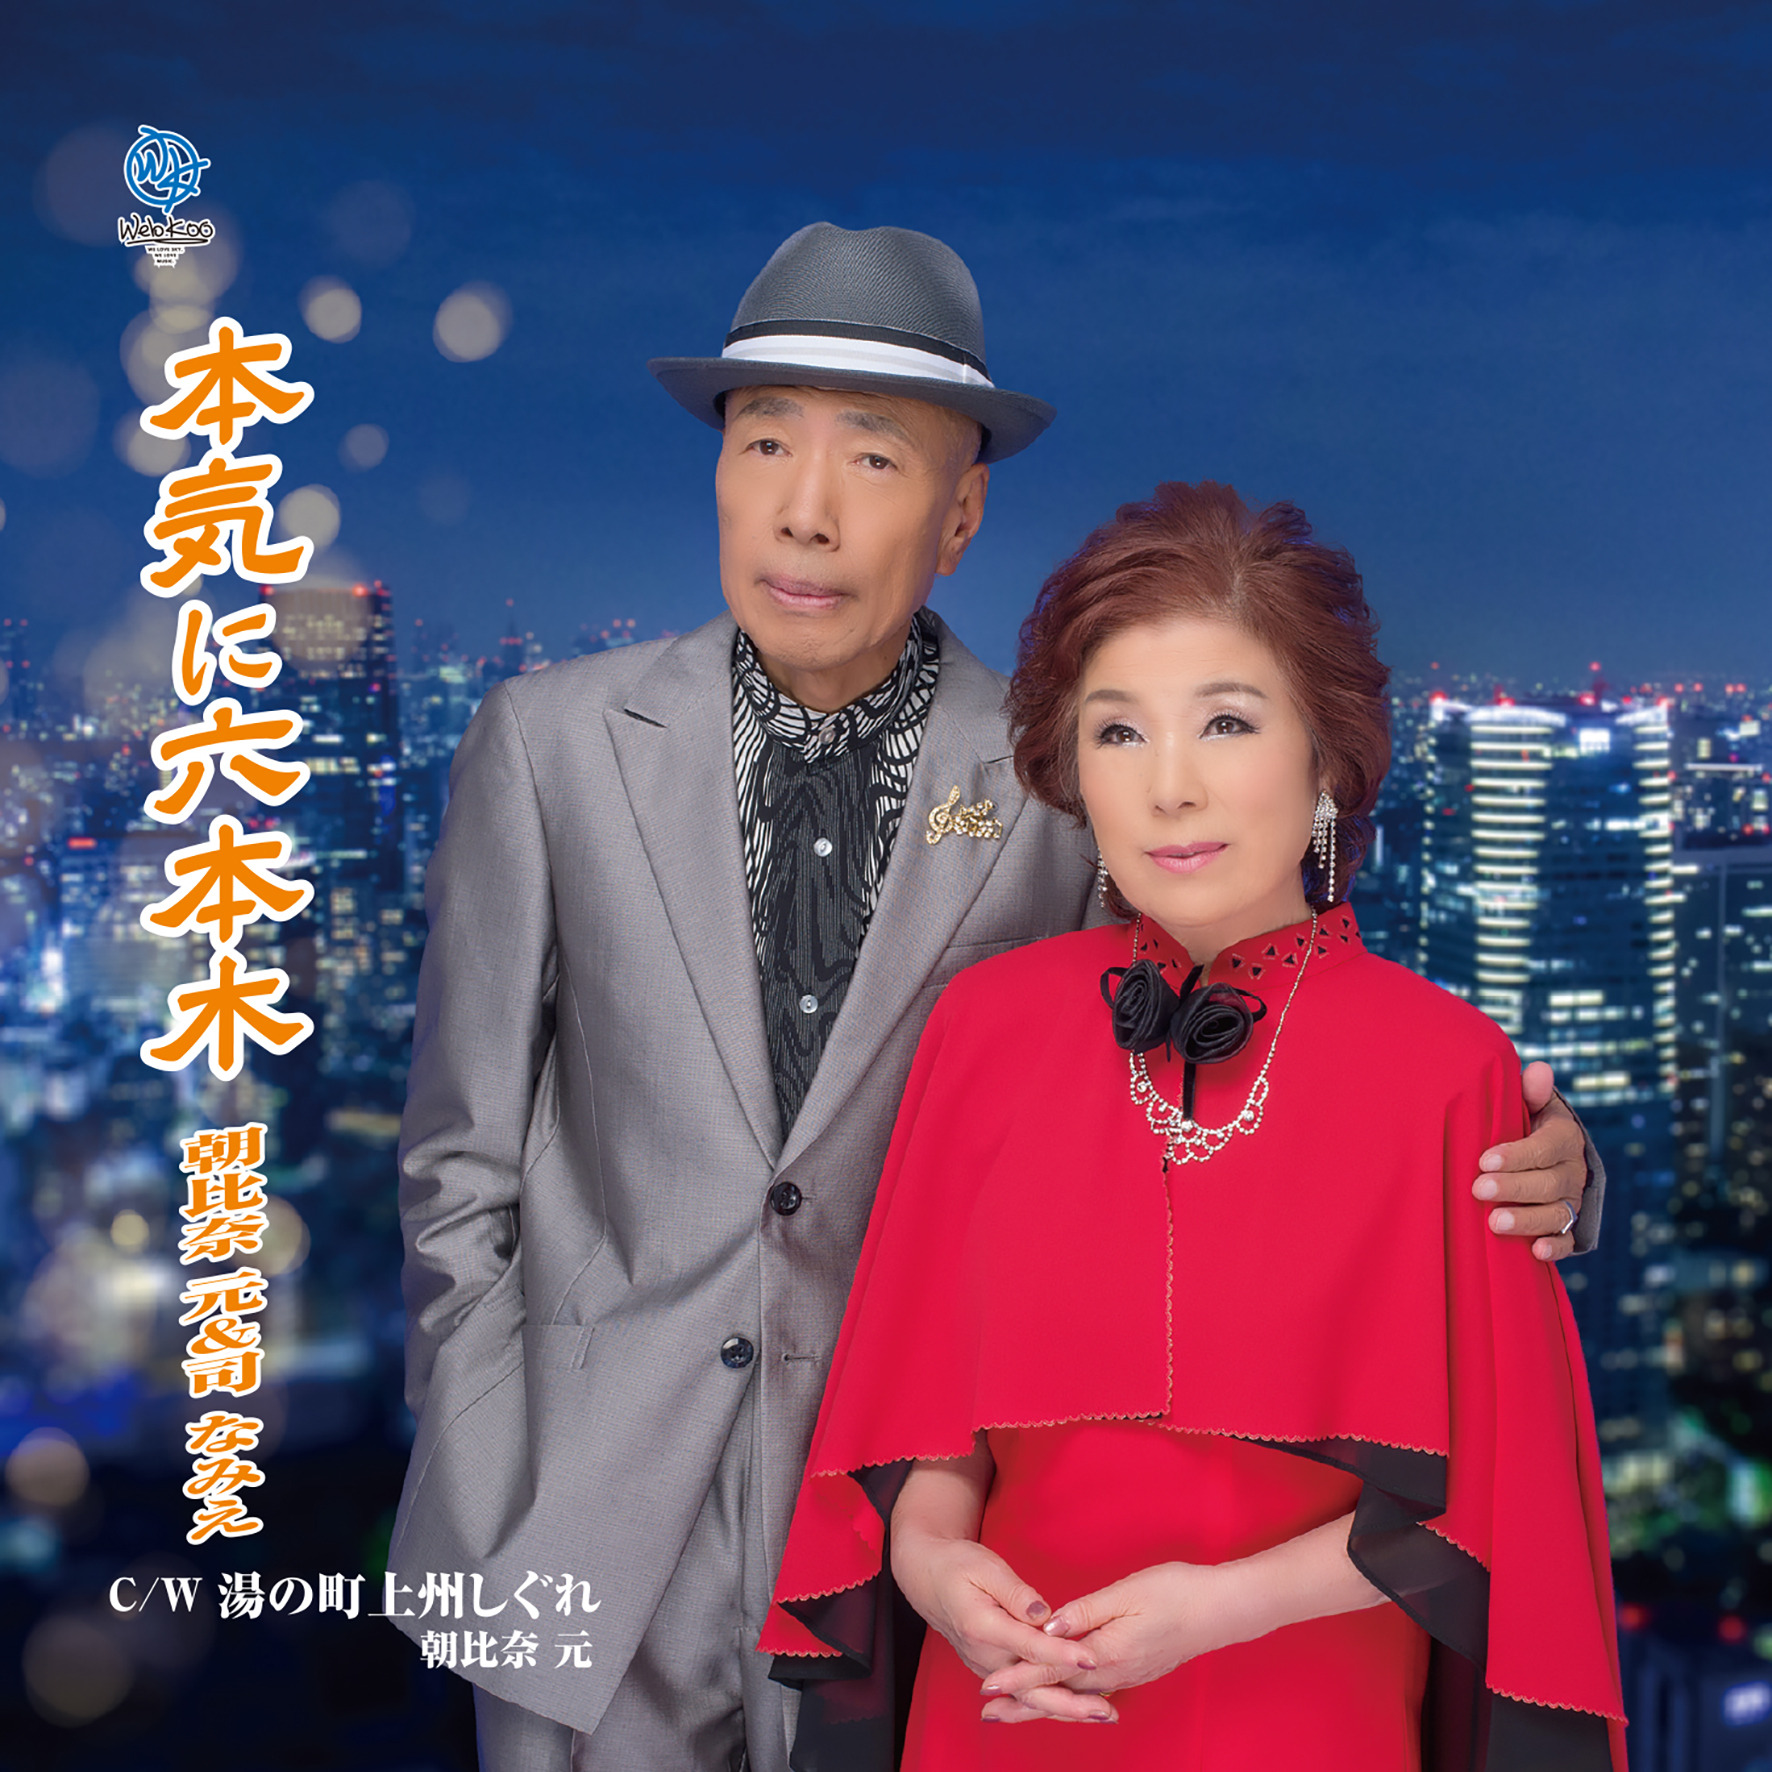 webkoo official site 朝比奈元